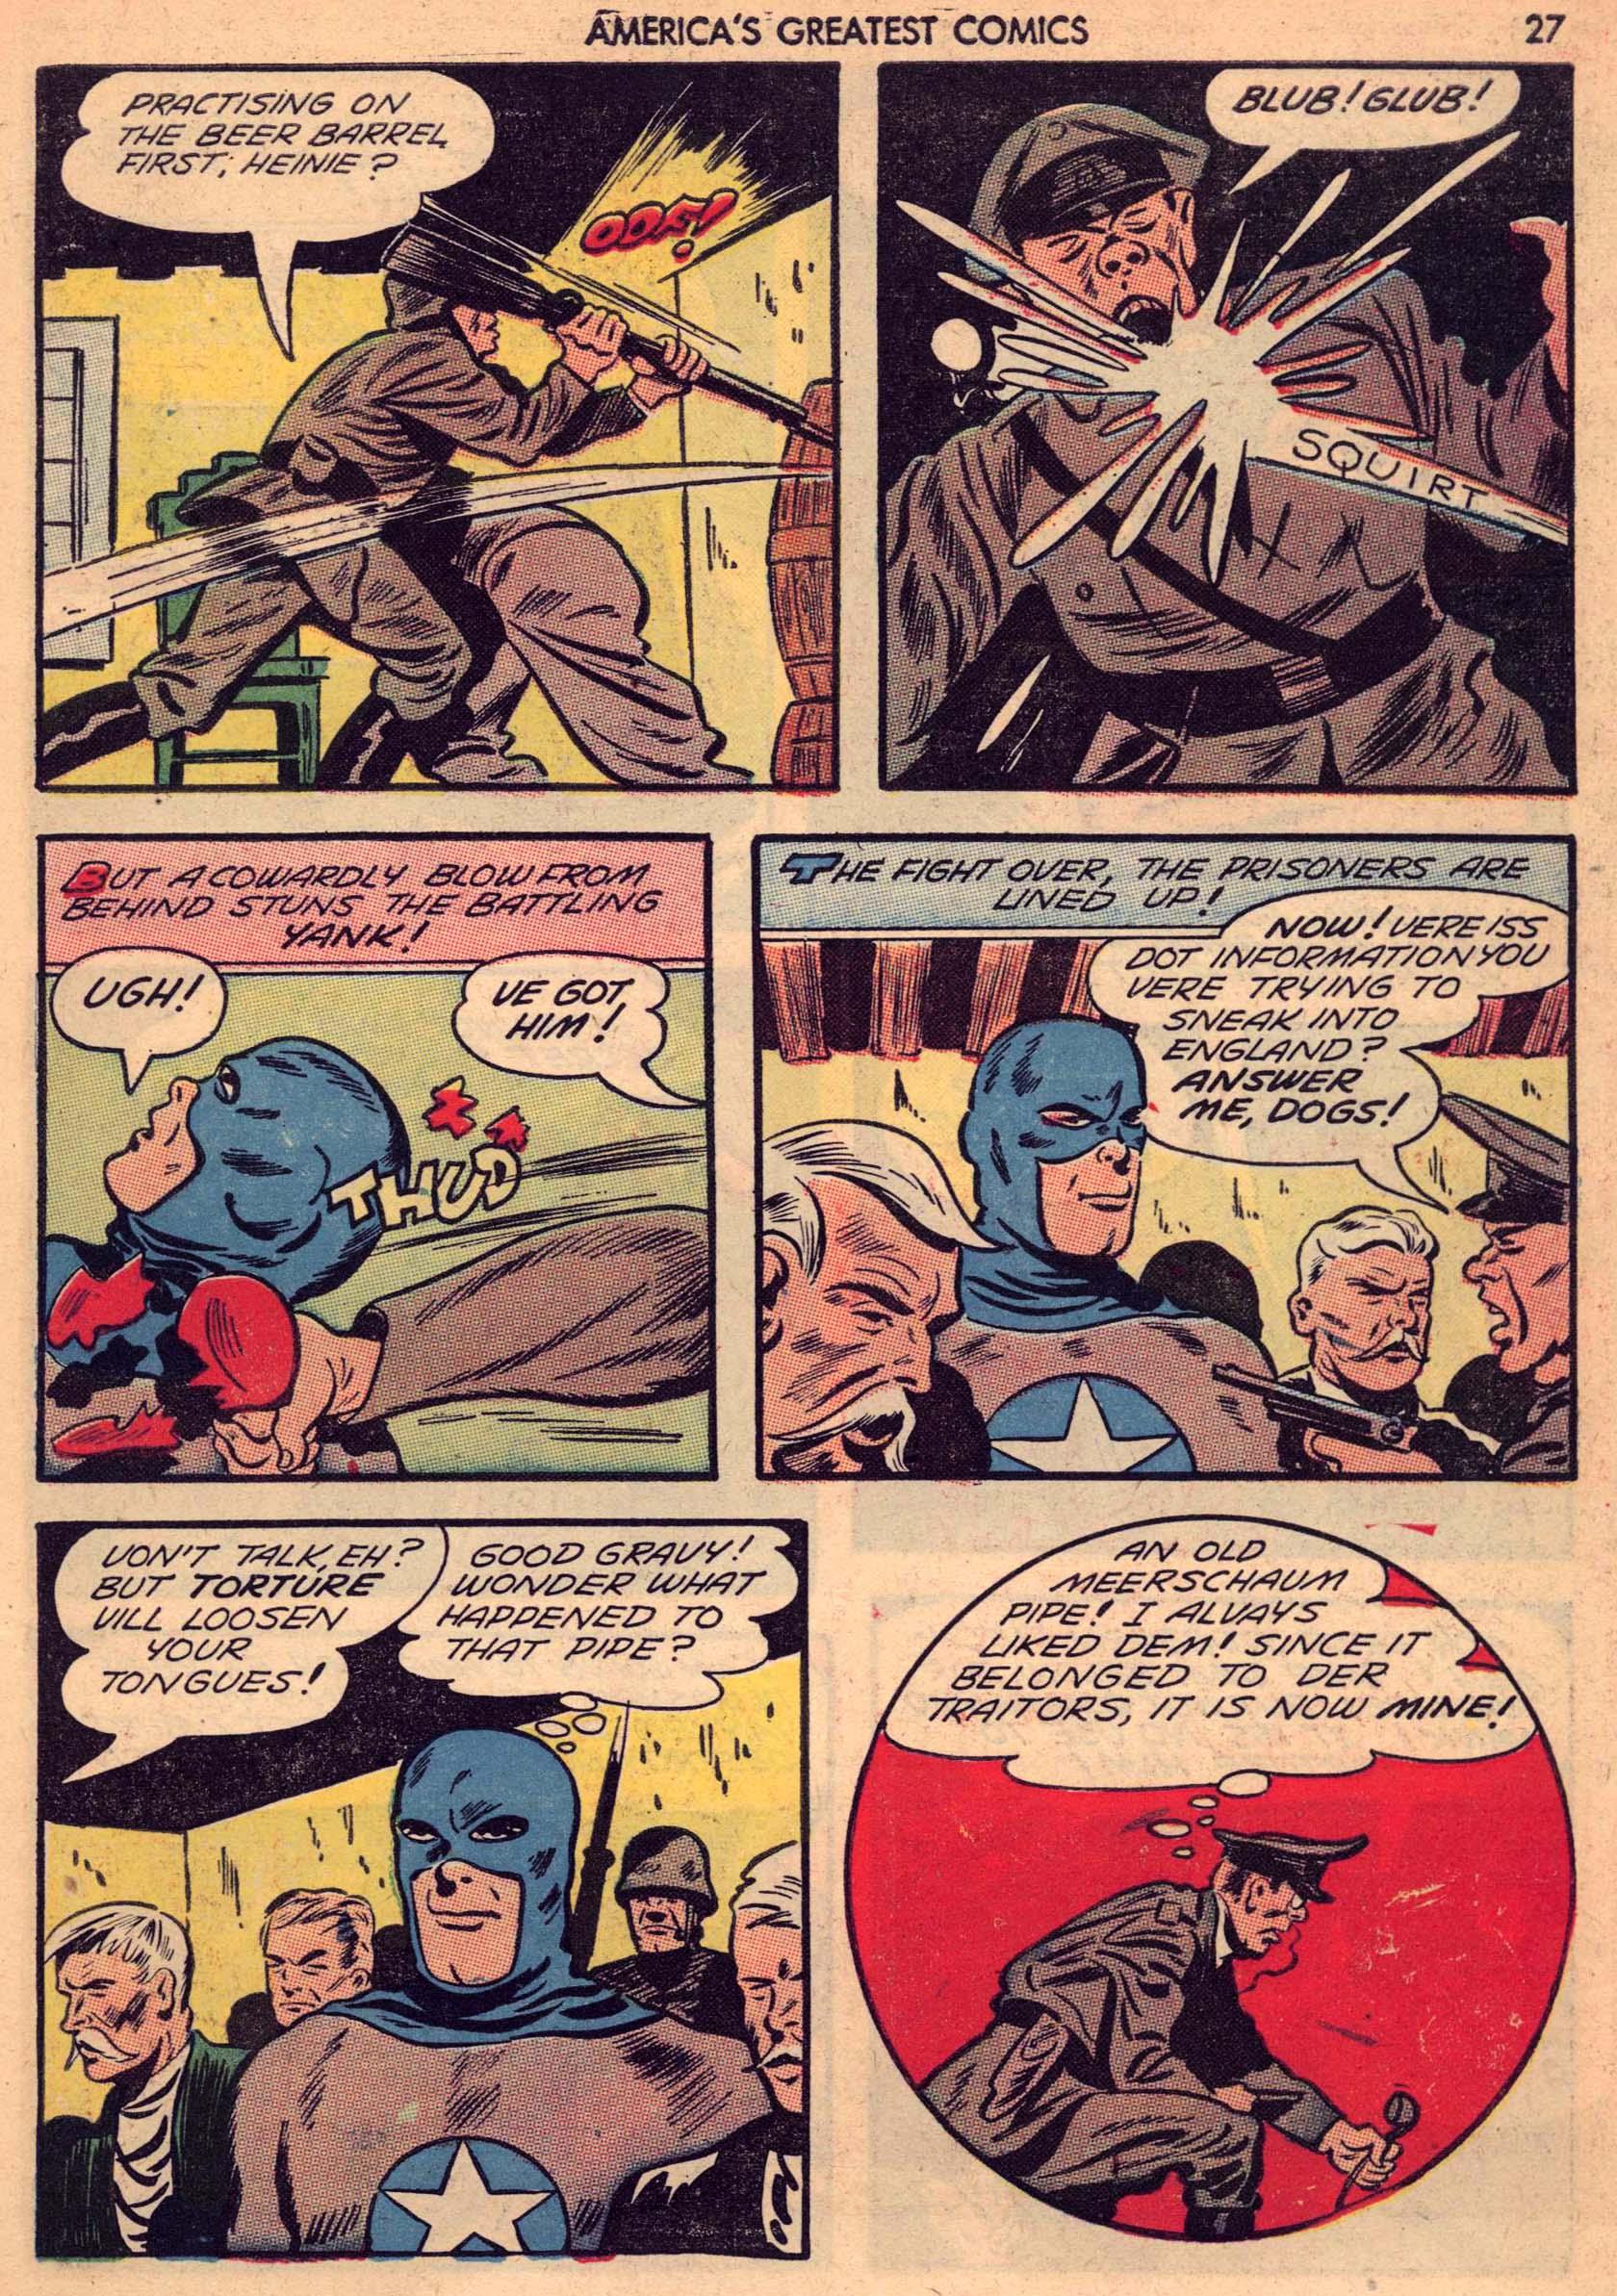 Read online America's Greatest Comics comic -  Issue #7 - 26